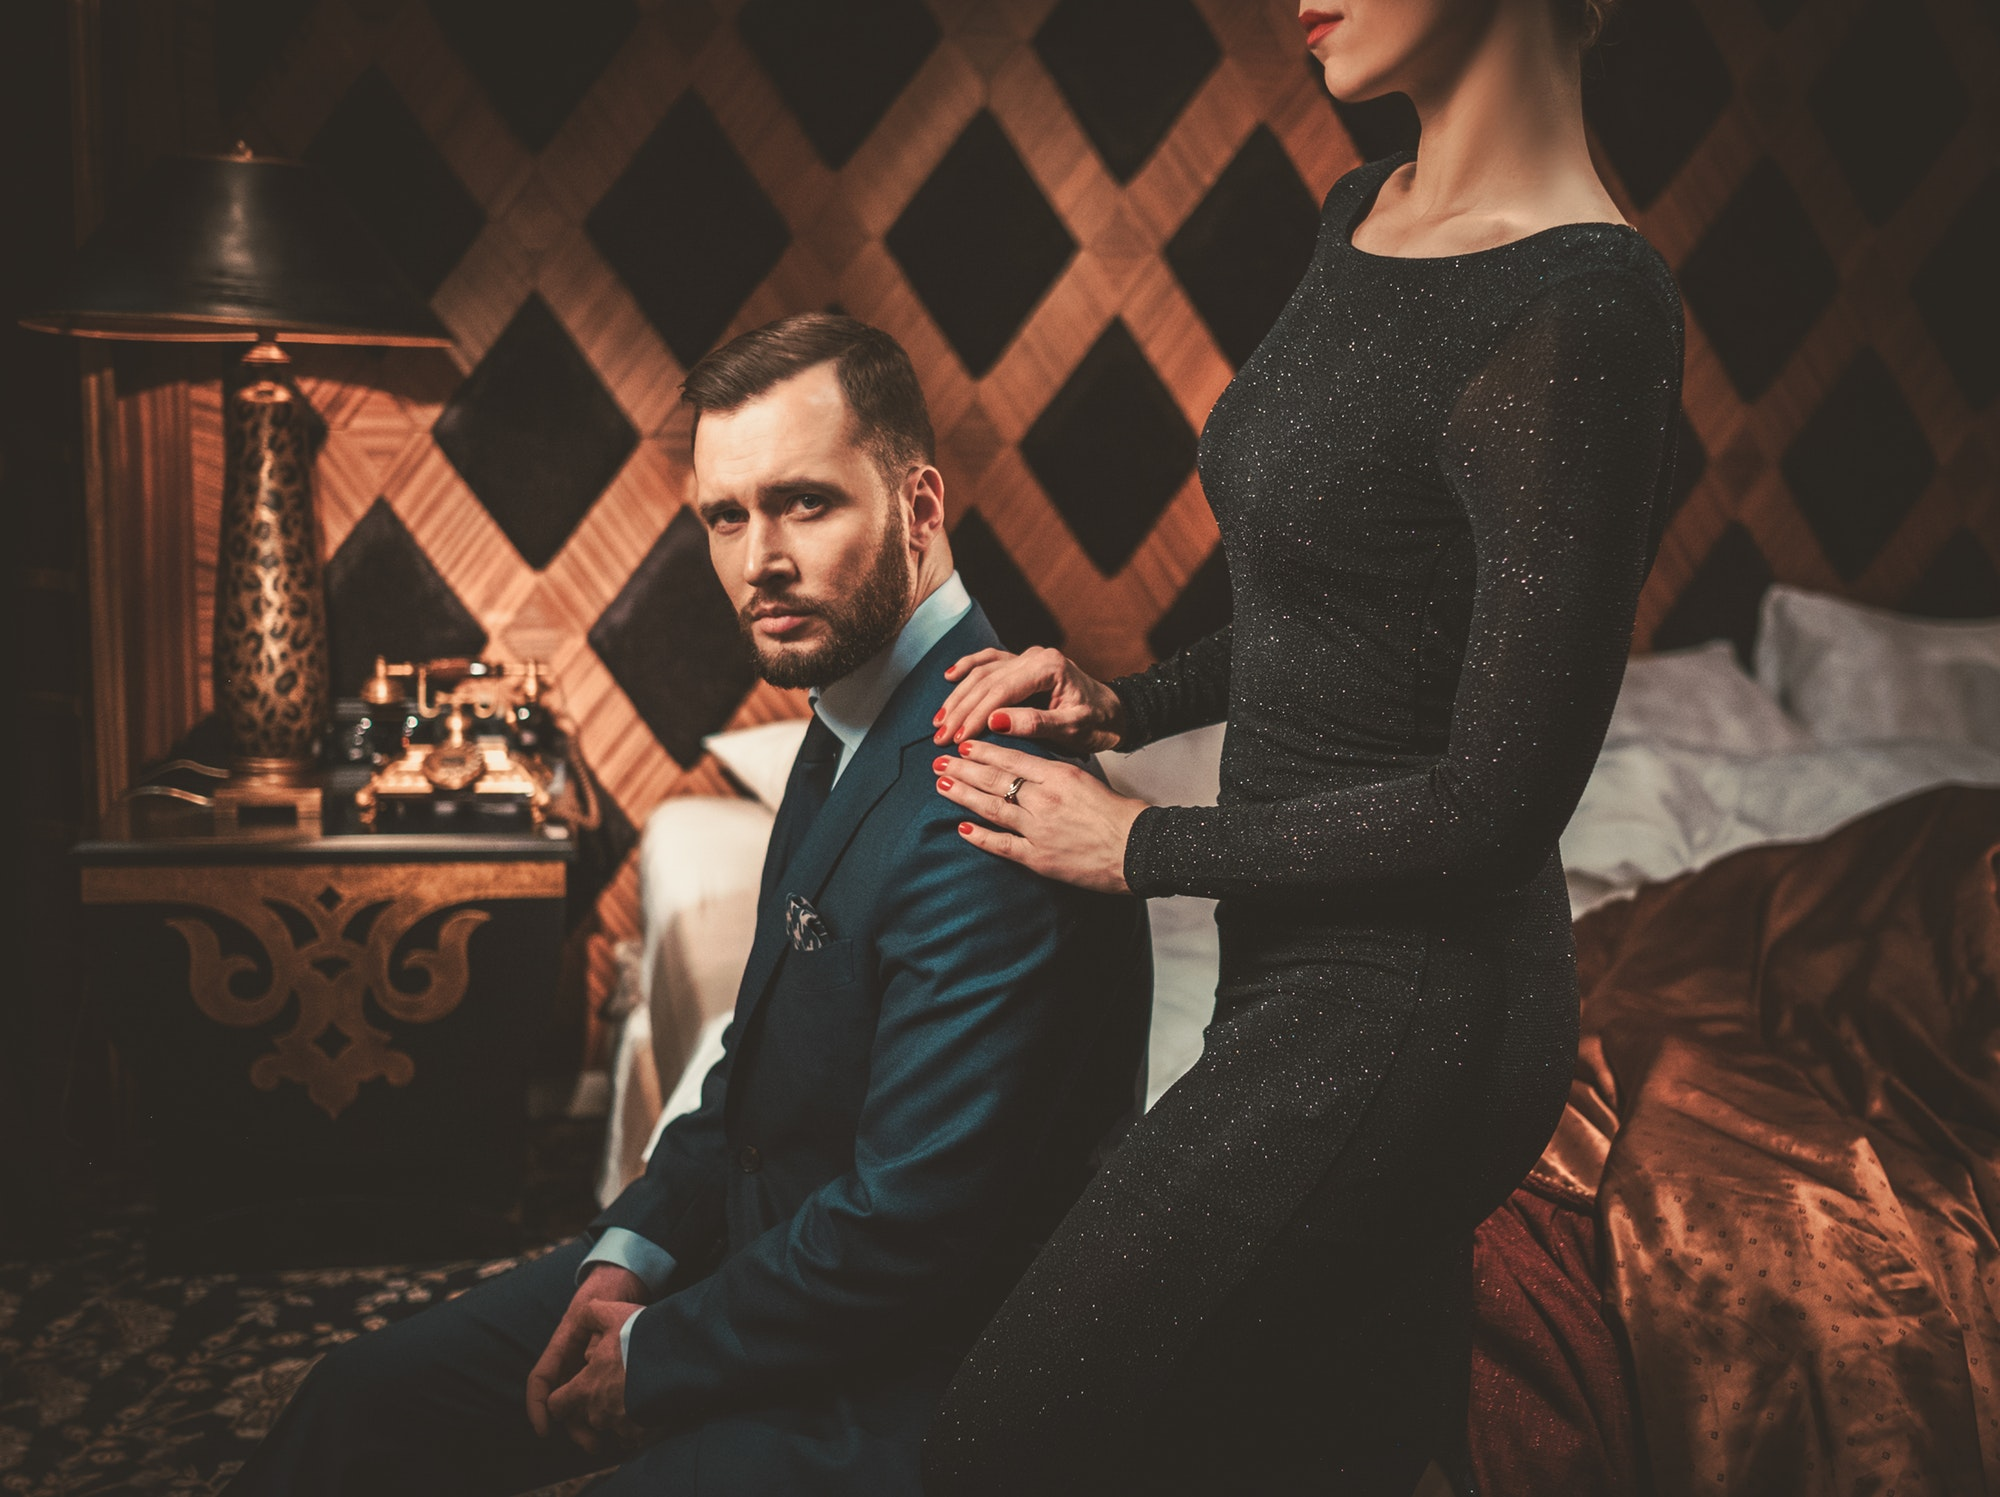 Well-dressed couple in luxury bedroom interior.